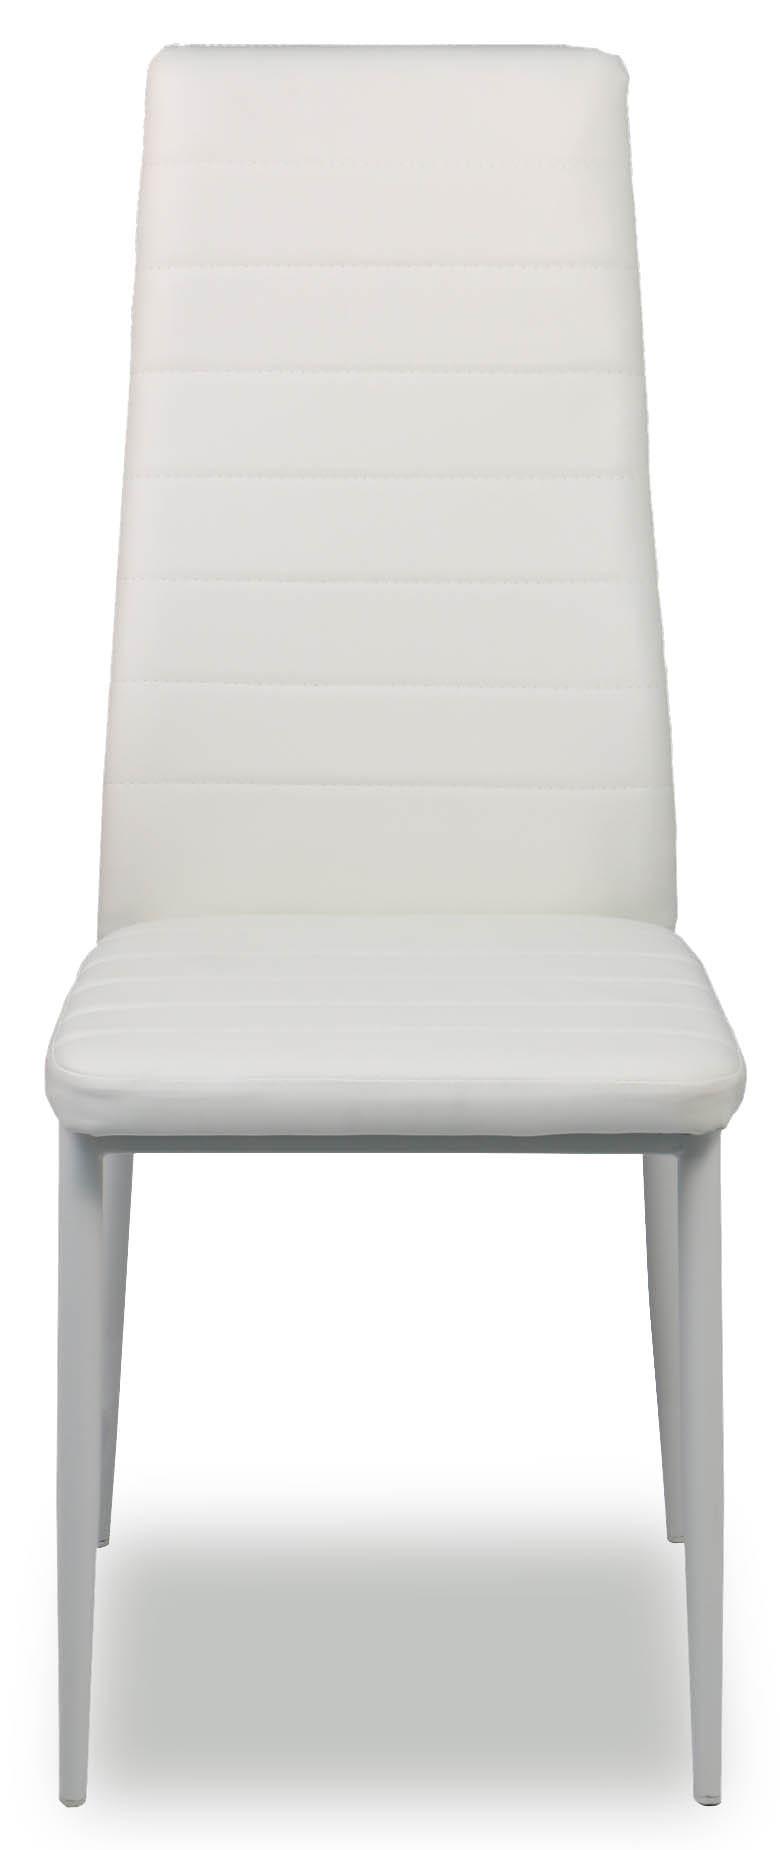 Quinn Dining Chair White | Furniture & Home Décor | Fortytwo Regarding Quinn Teak Sofa Chairs (Image 15 of 25)